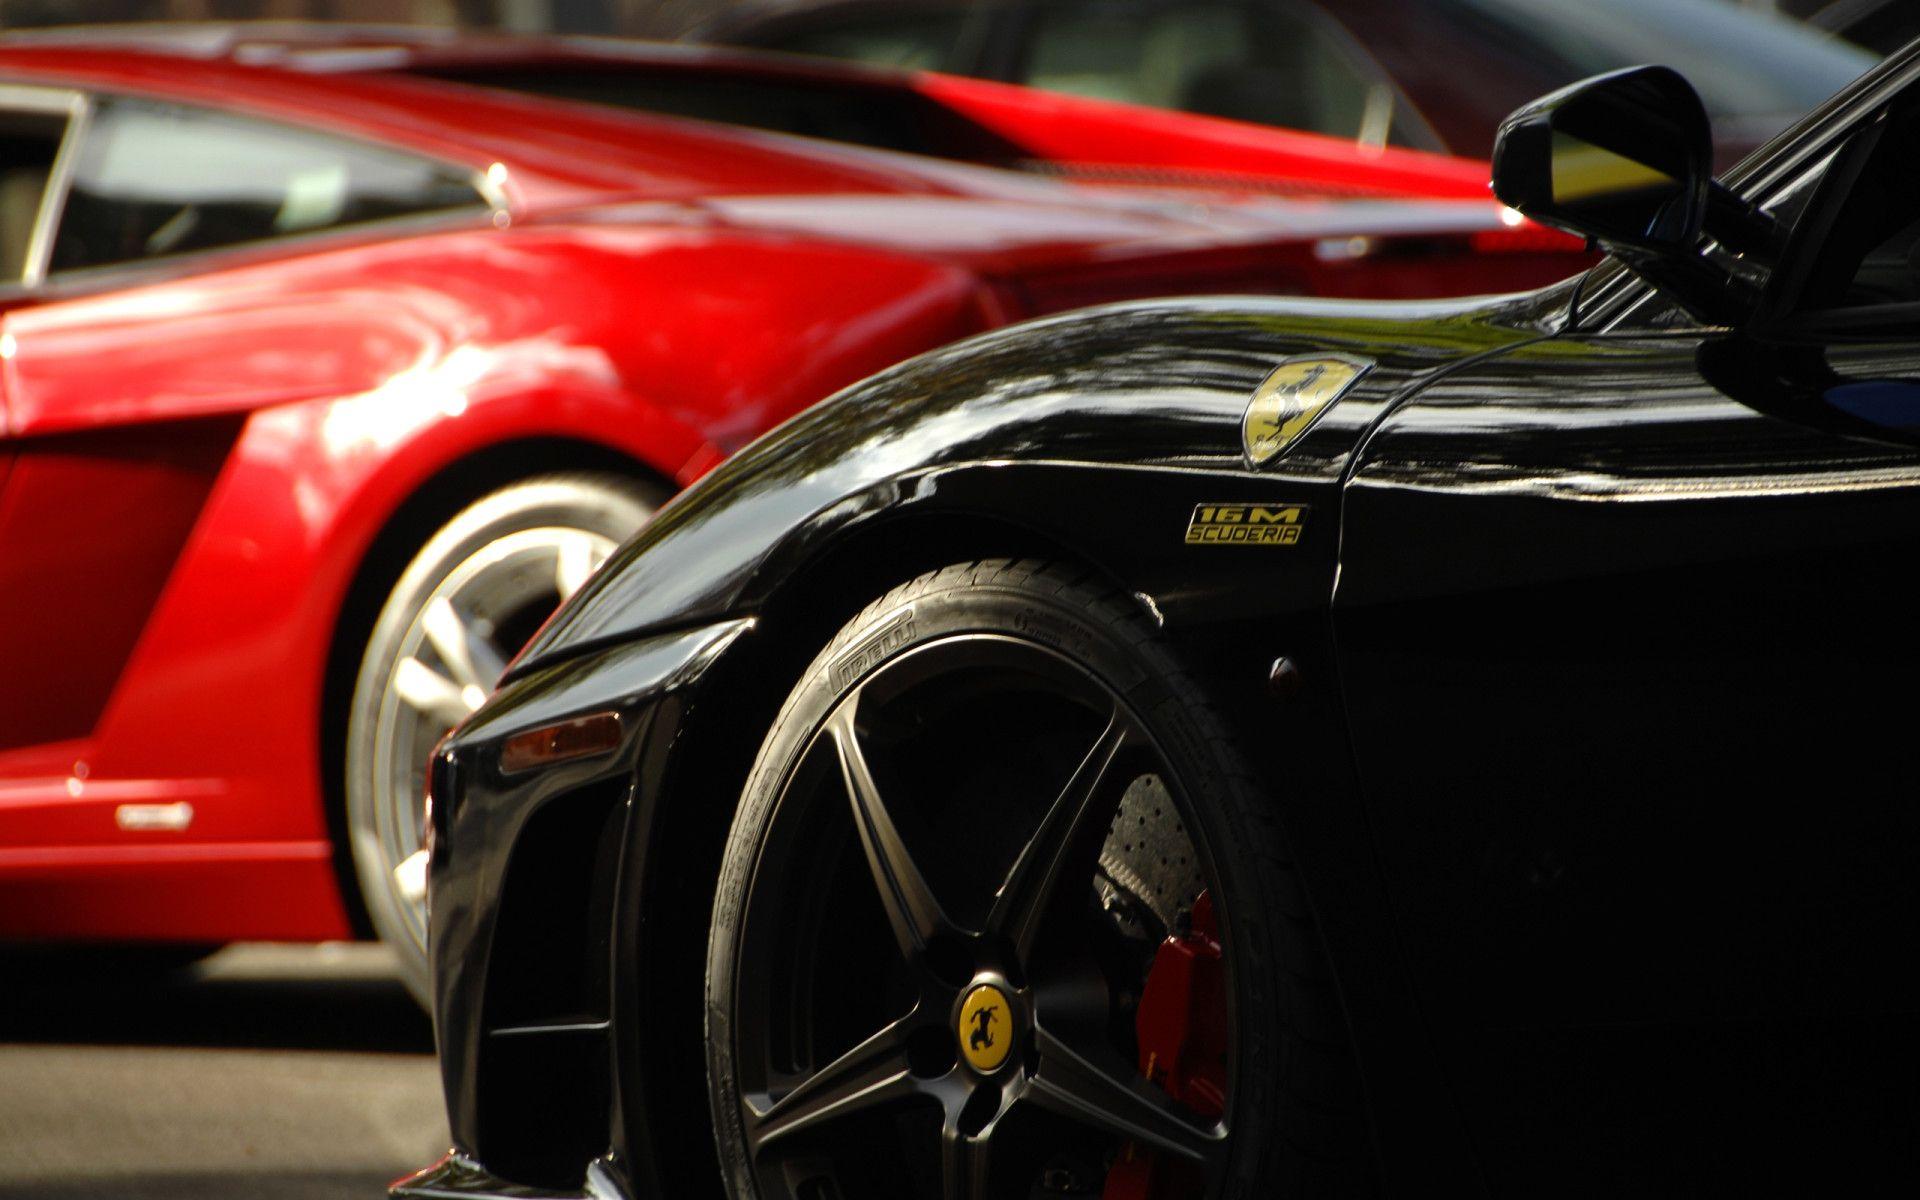 Pin By Sean Kirkpatrick On Cars Luxury Car Hire Ferrari Scuderia Ferrari